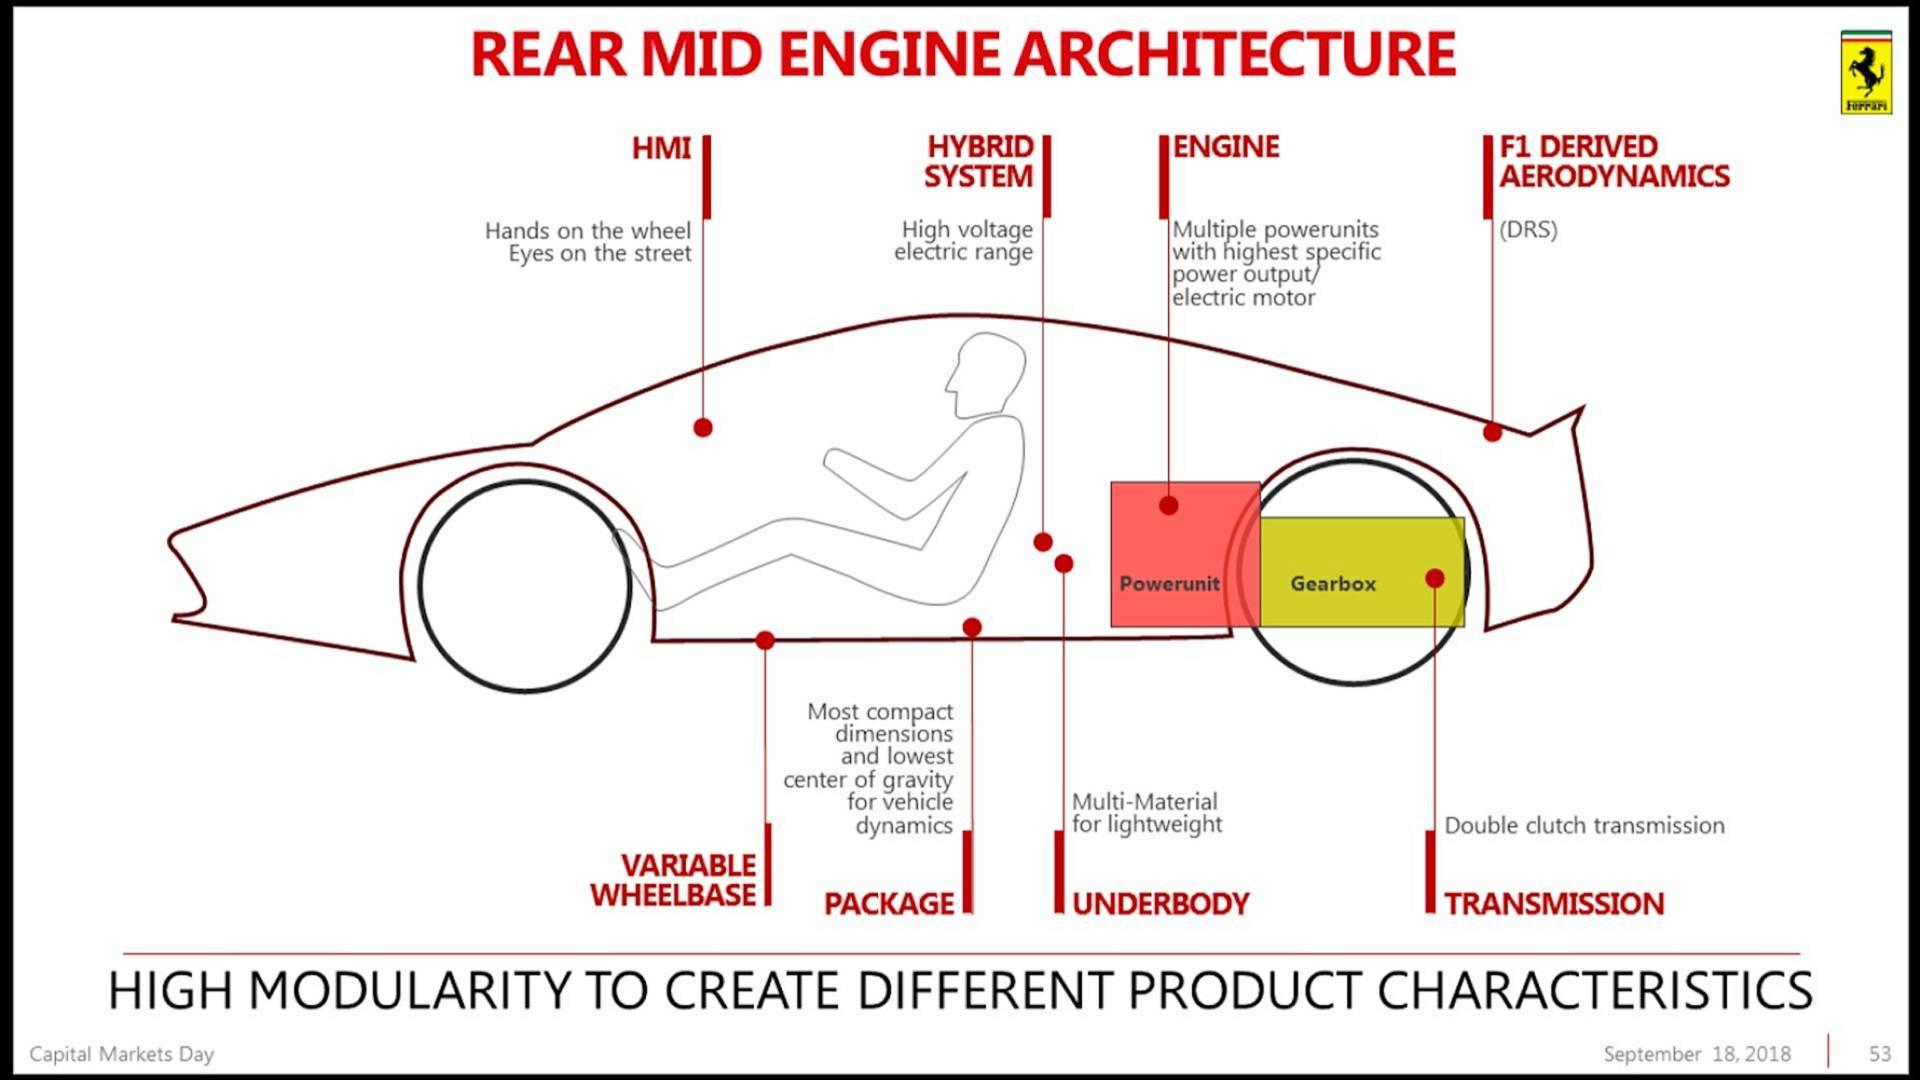 Piano Industriale Ferrari 2018-2022 (44)